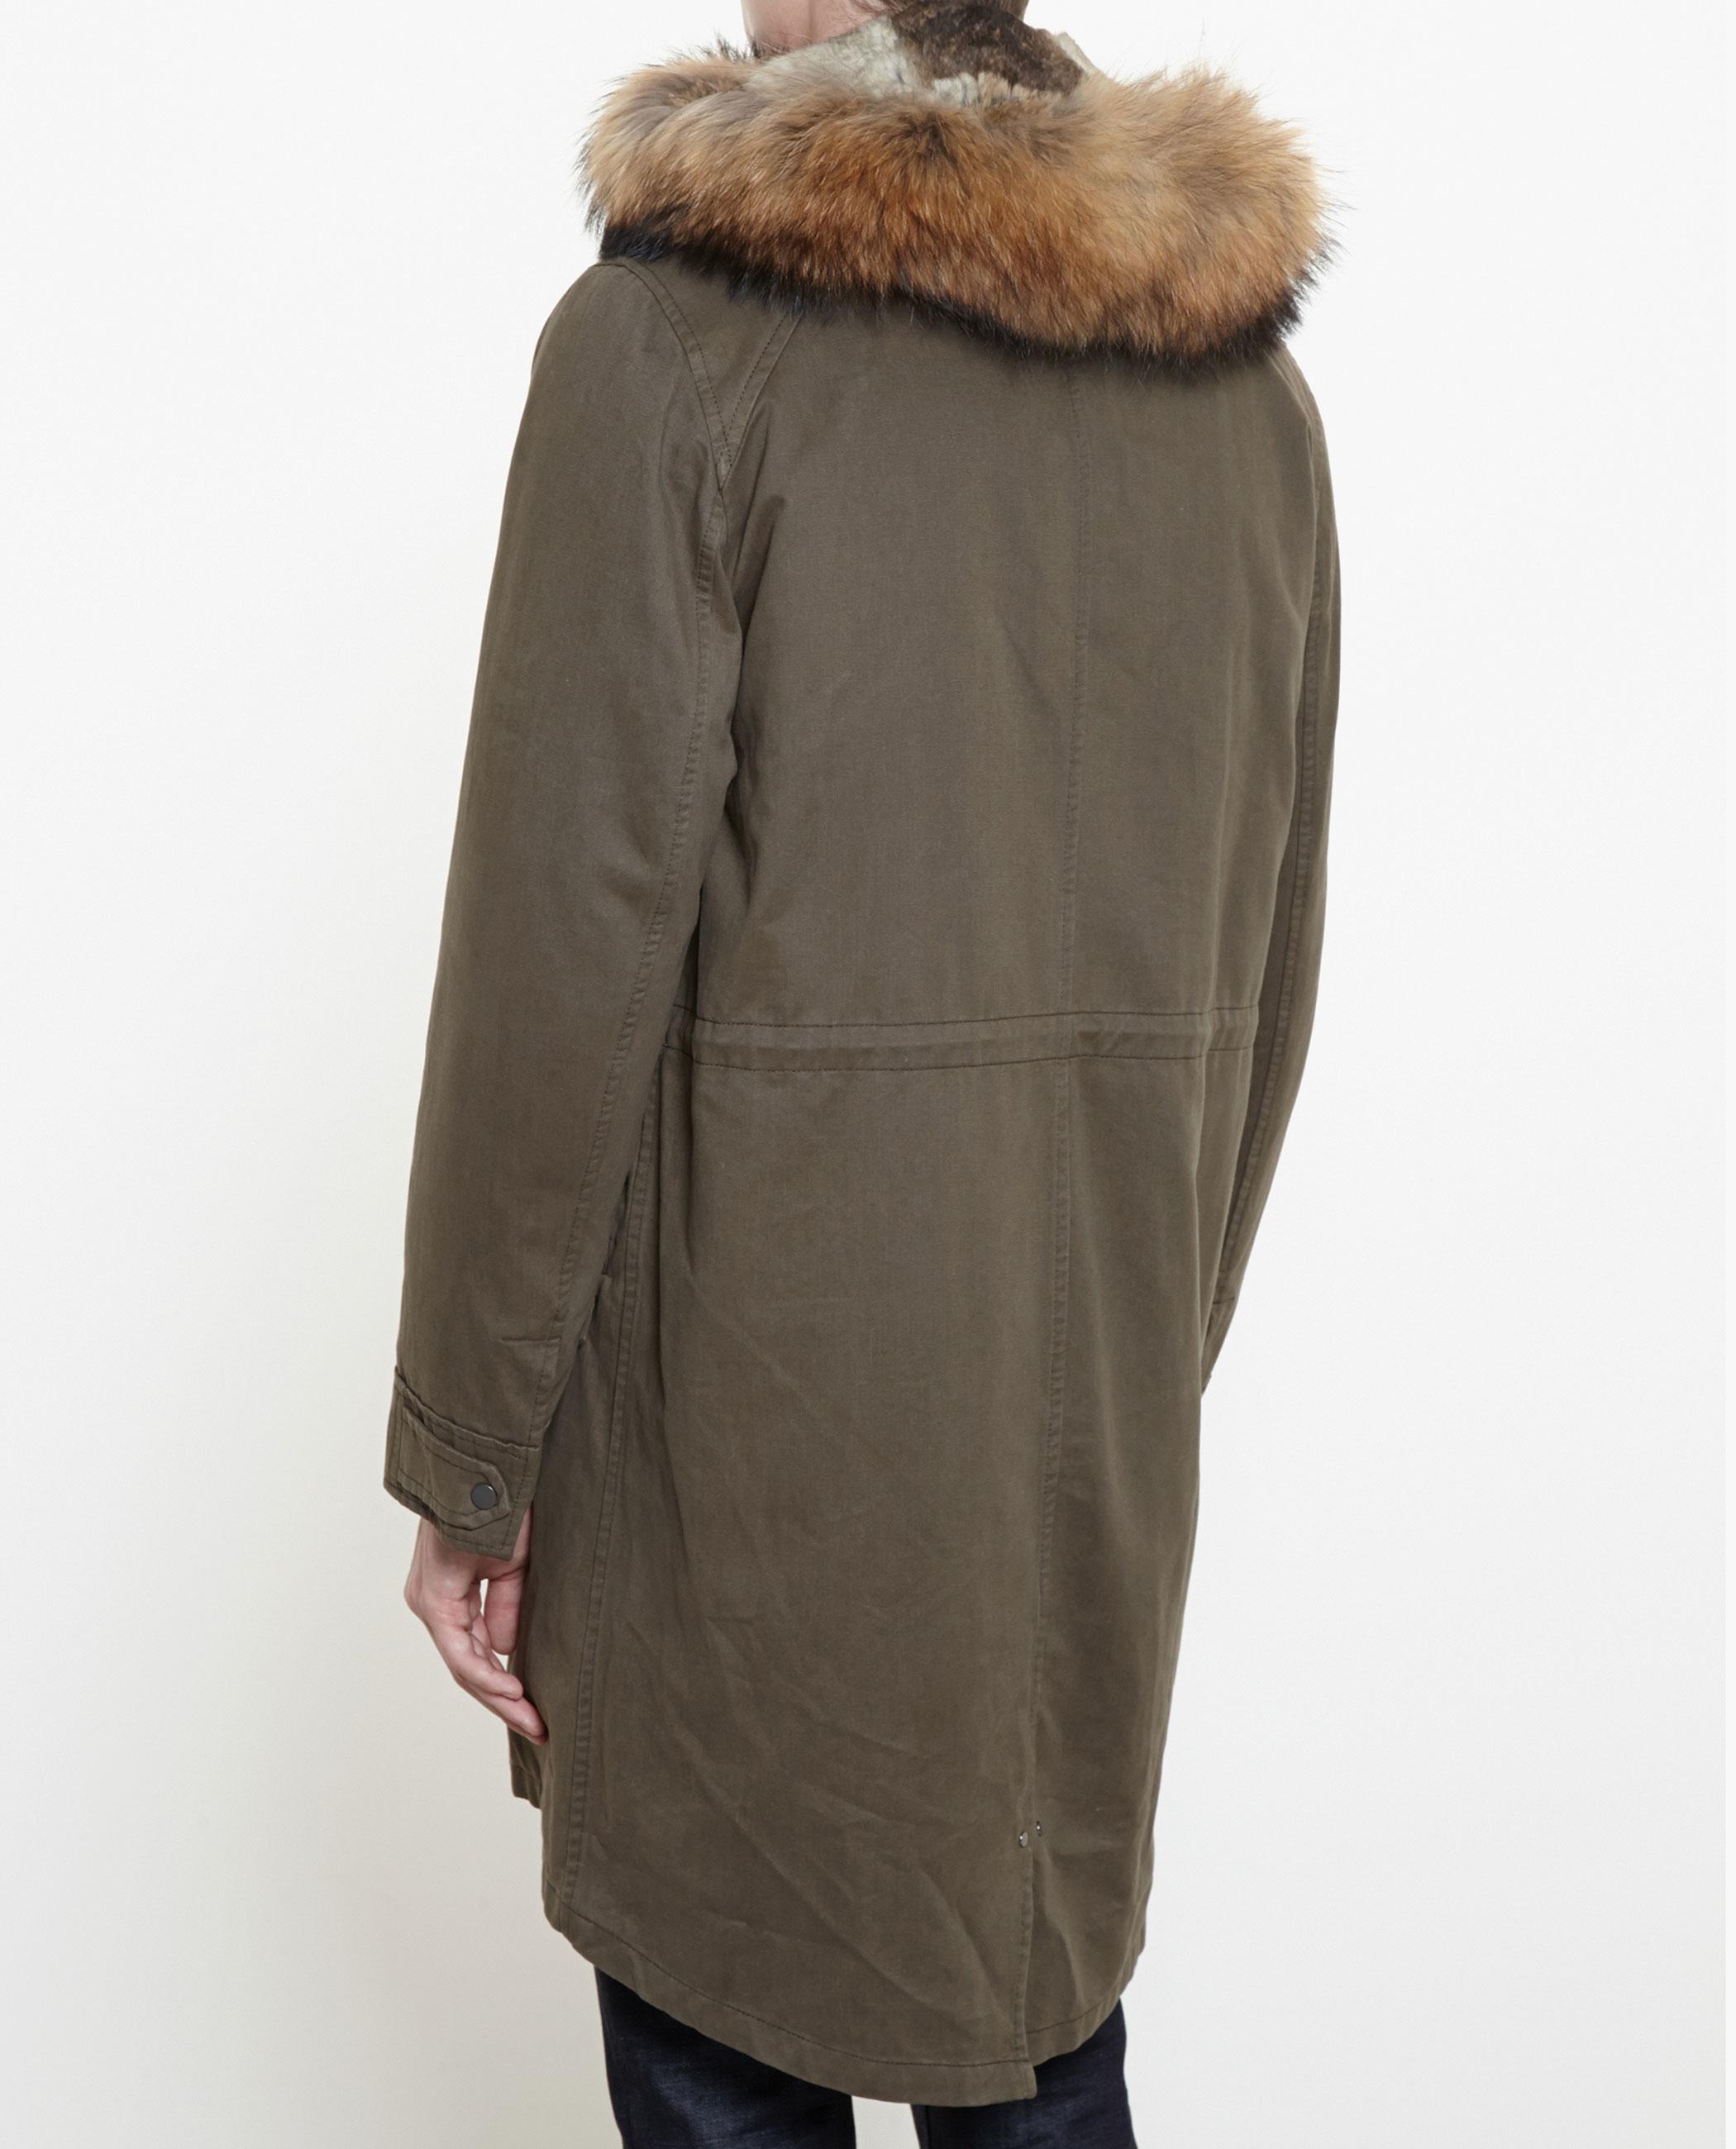 84183b9777c6 Lyst - Yves Salomon Classic Rabbit Fur-lined Canvas Parka in Gray ...